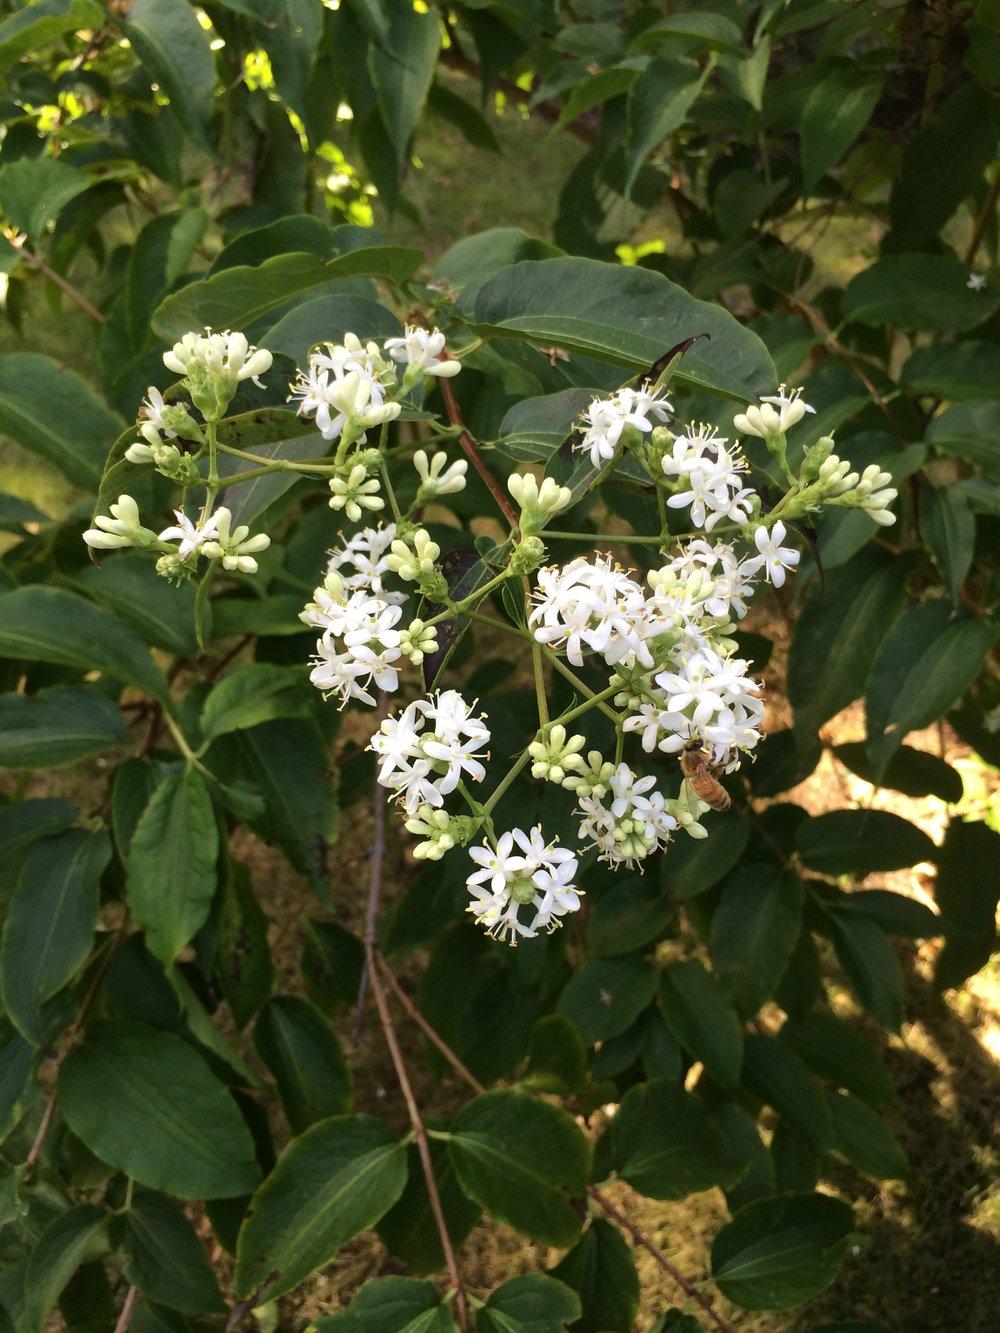 Heptacodium miconioides (tall shrub)